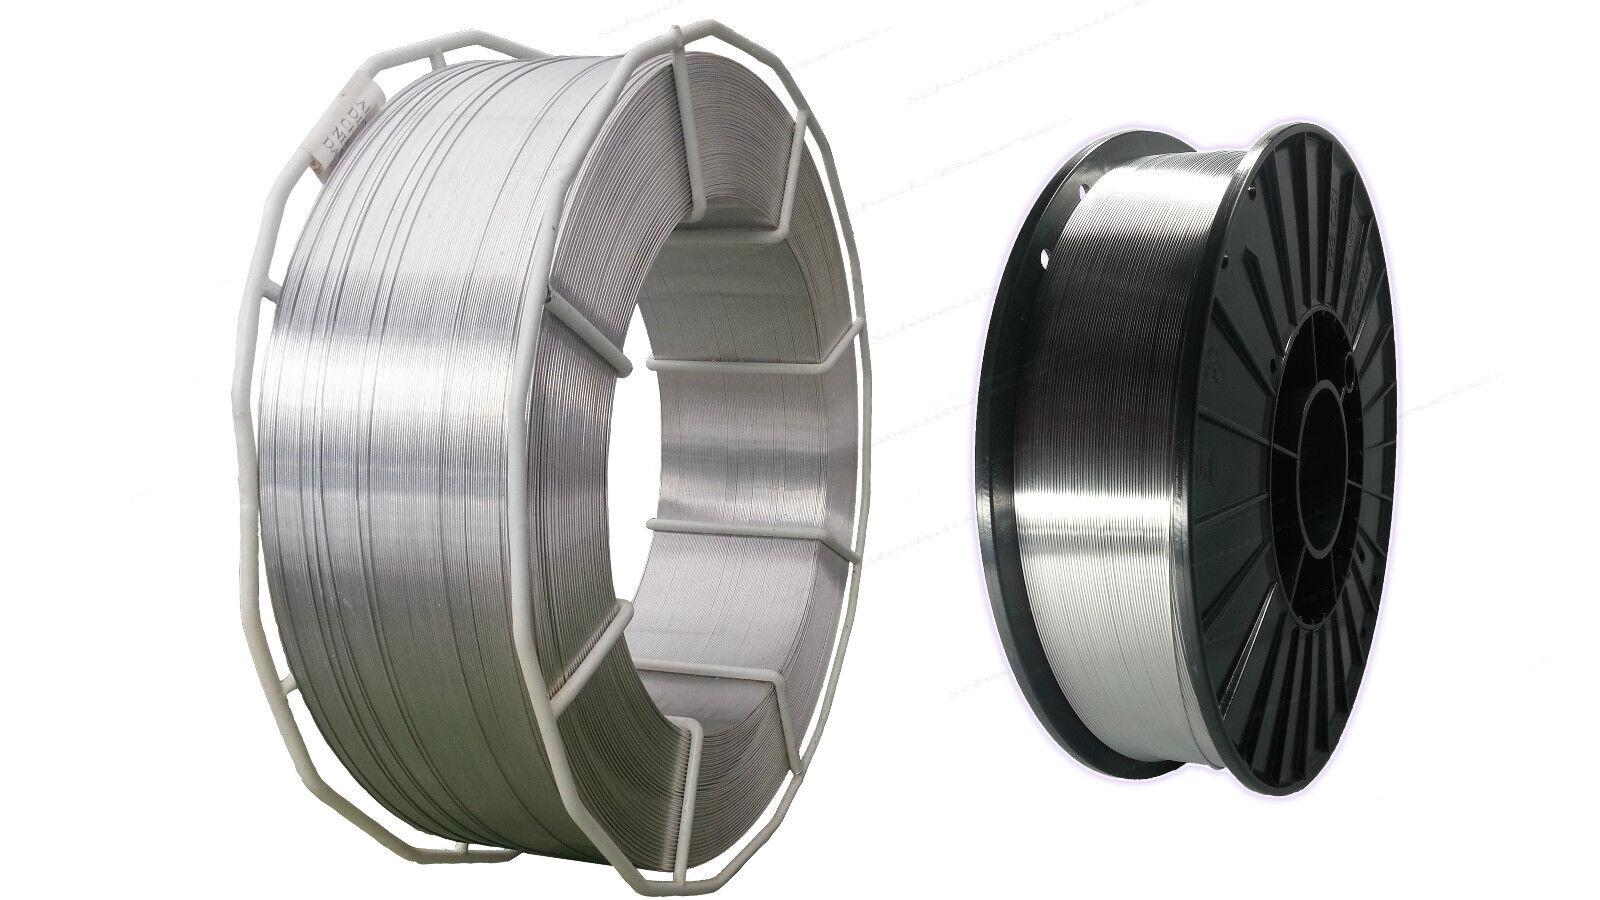 Almg5 Almg 5 3.3556 Aluminium Schweißdraht 2kg/7kg 0,8-1,2mm MIG MAG Alu Draht